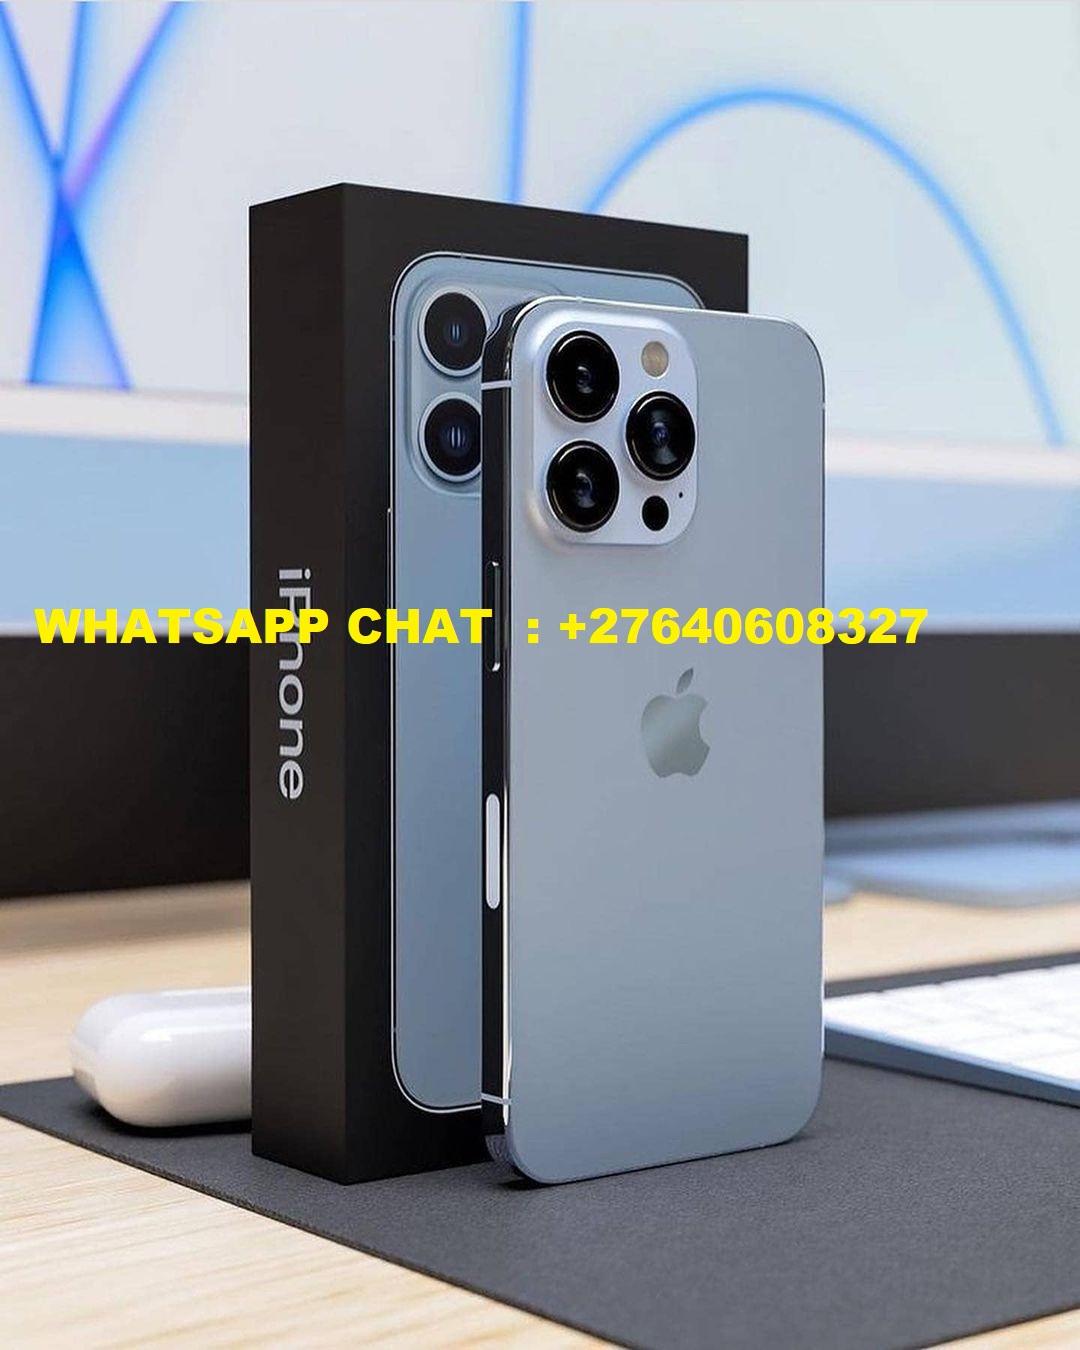 Apple iPhone 13 Pro, iPhone 13 Pro Max, iPhone 13, iPhone 13 Mini, iPhone 12 Pro, iPhone 12 Pro Max, iPhone 12, iPhone 12 Mini, iPhone 11 Pro, iPhone 11 Pro Max , Sony PS5, Apple iPad Pro Chip M1